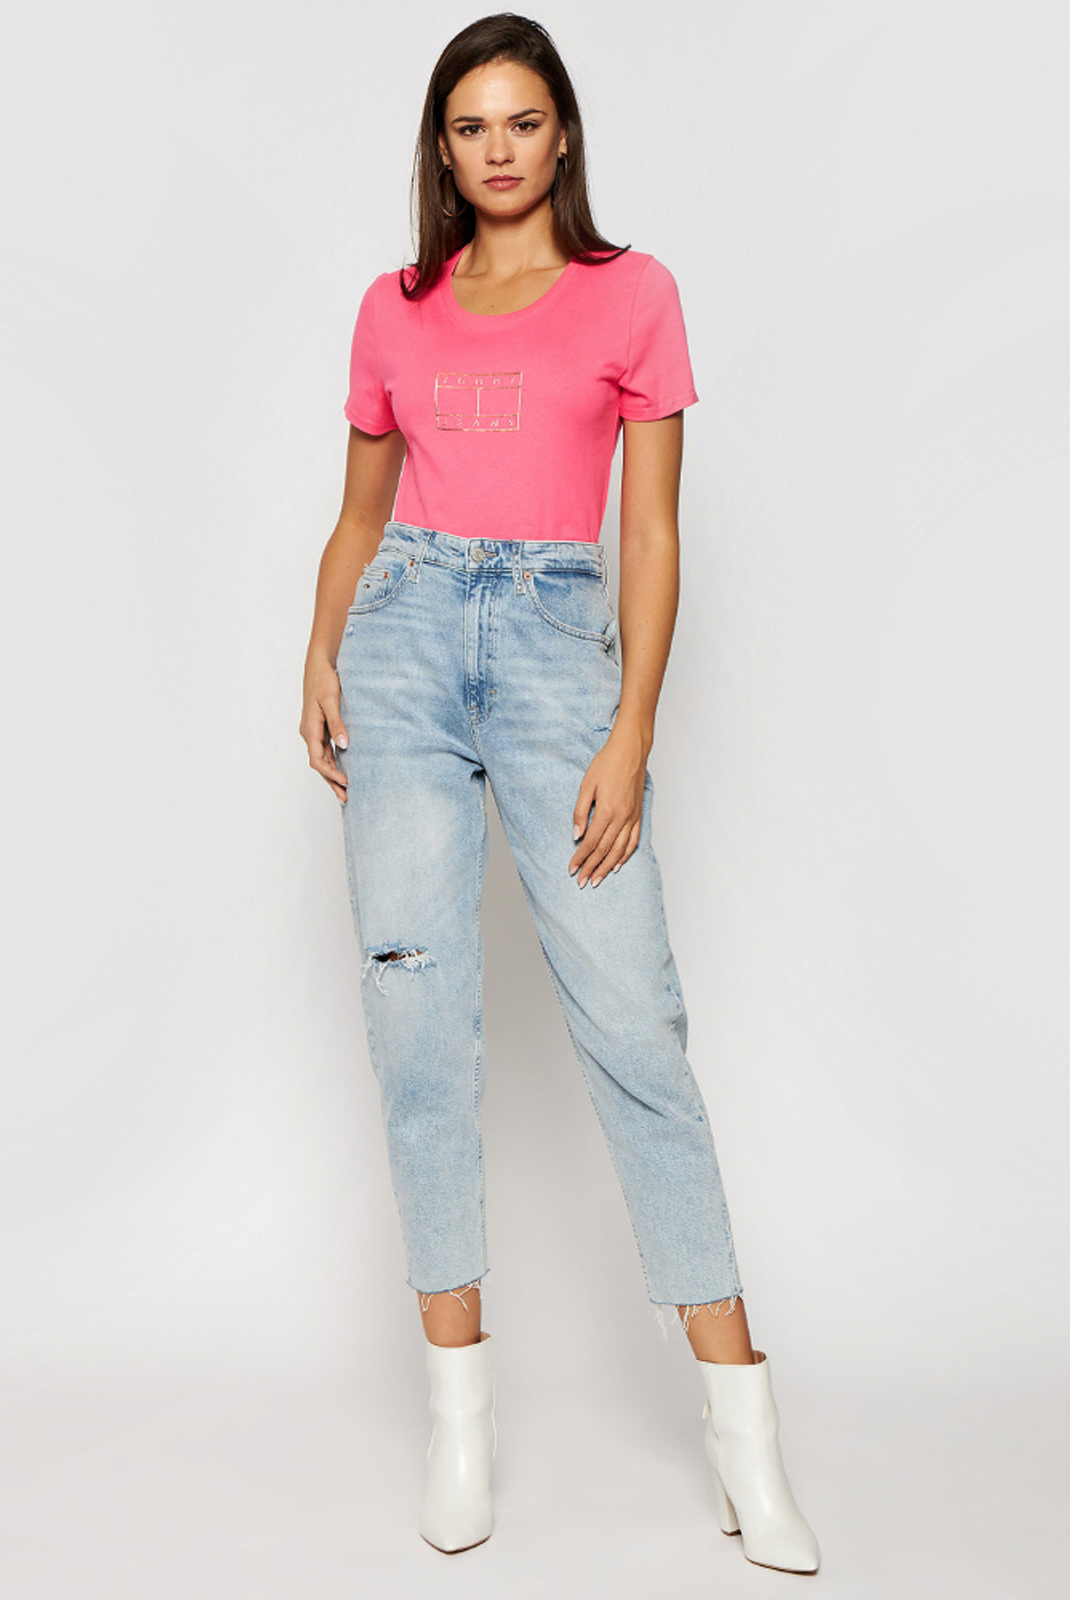 Tee shirt  Tommy Jeans DW0DW08473 TIK rose